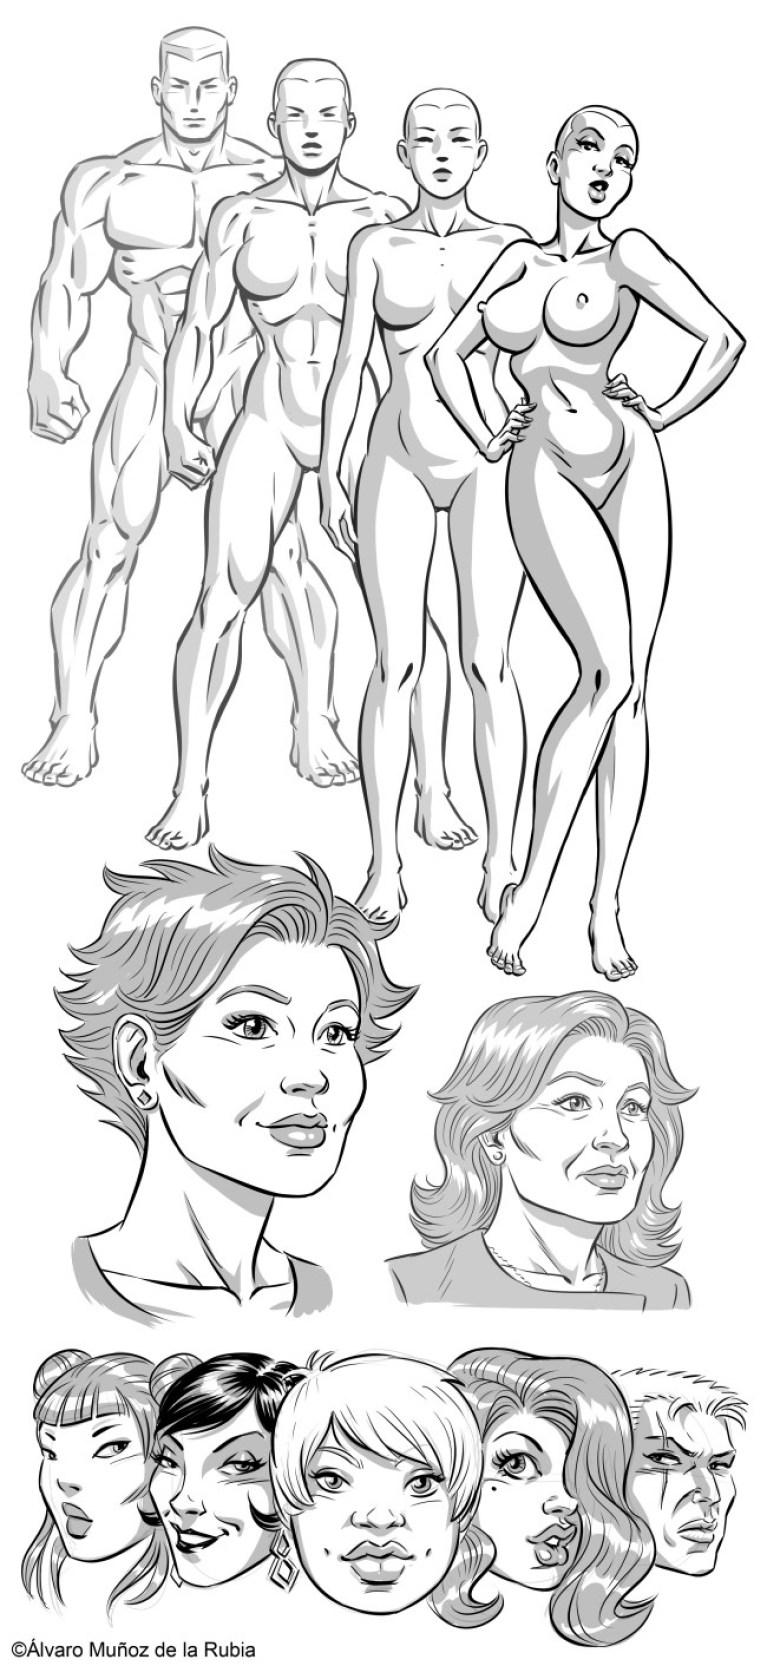 postc10_feminidad_taller_dibujo_comic_mujeres_portada1